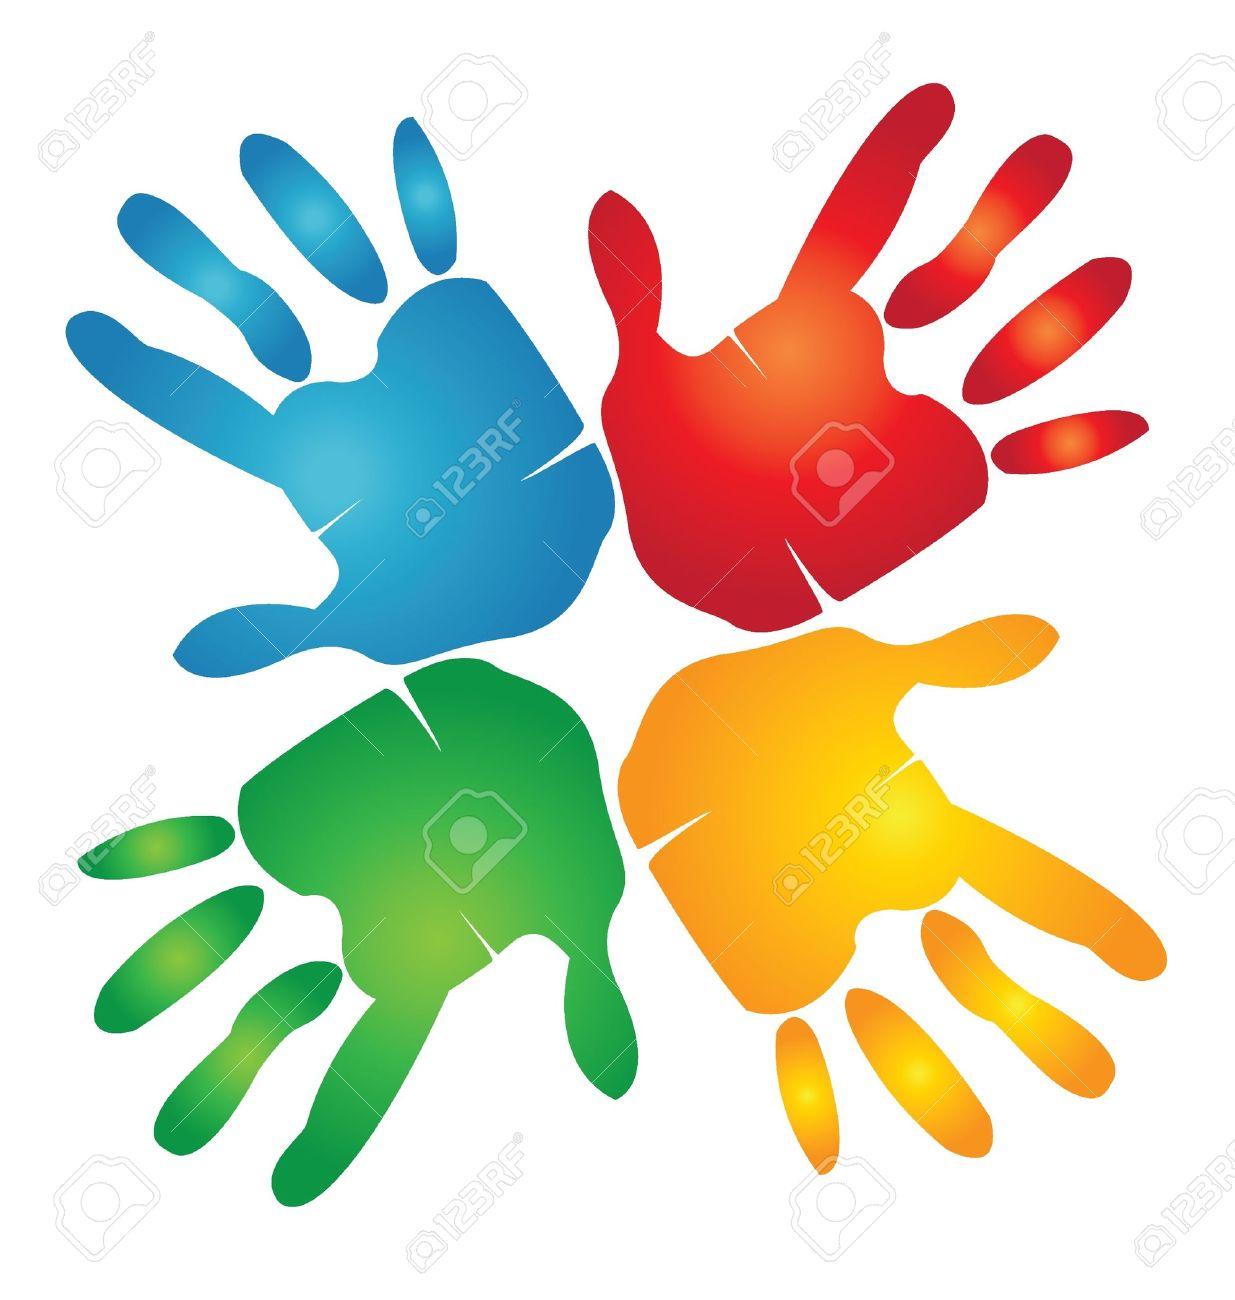 Teamwork hands around colorful logo - 15252966